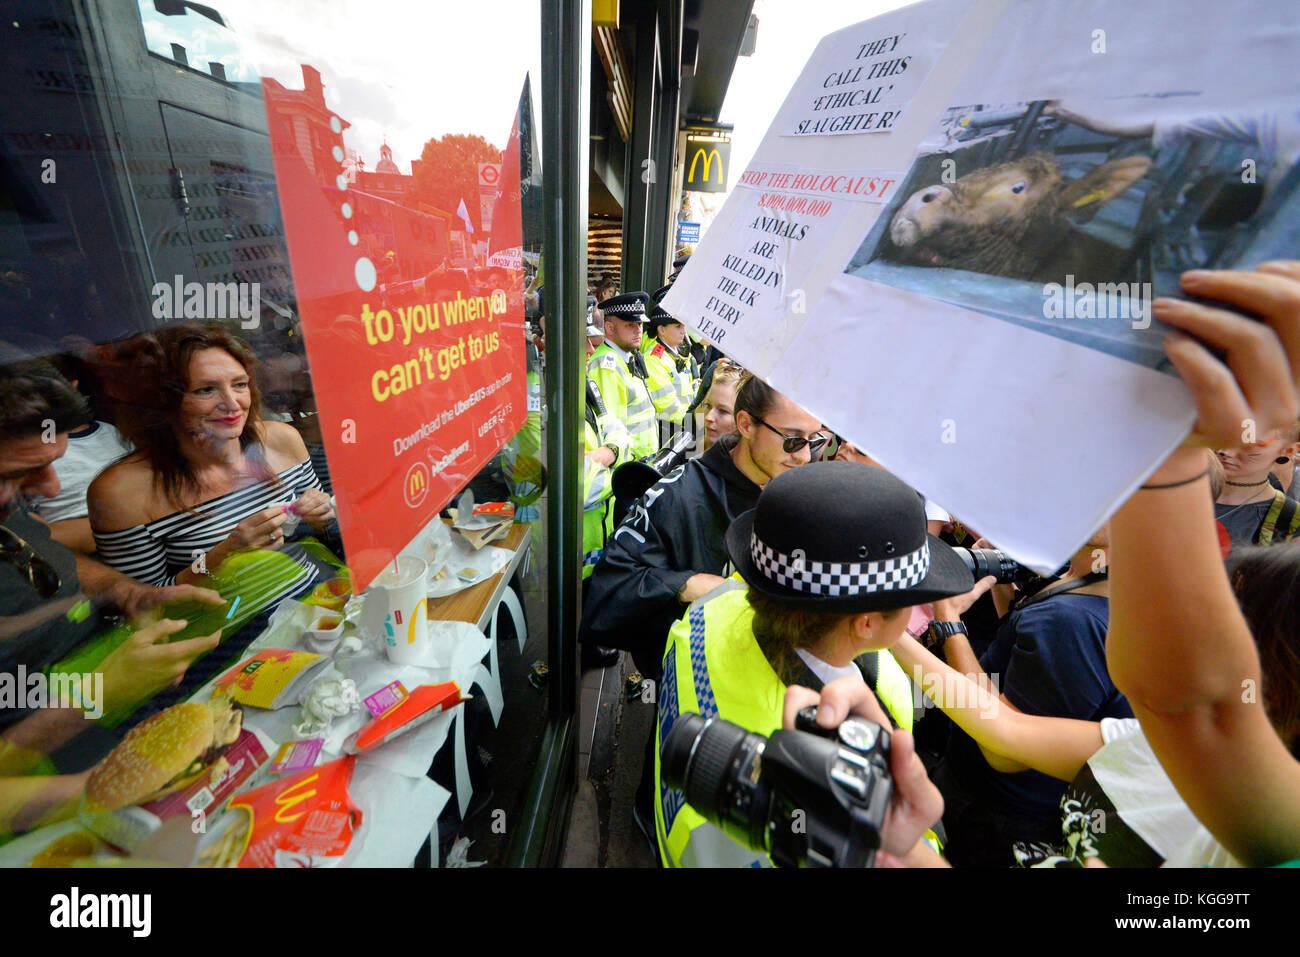 vegan-activists-besieging-a-mcdonalds-restaurant-in-whitehall-london-KGG9TT.jpg